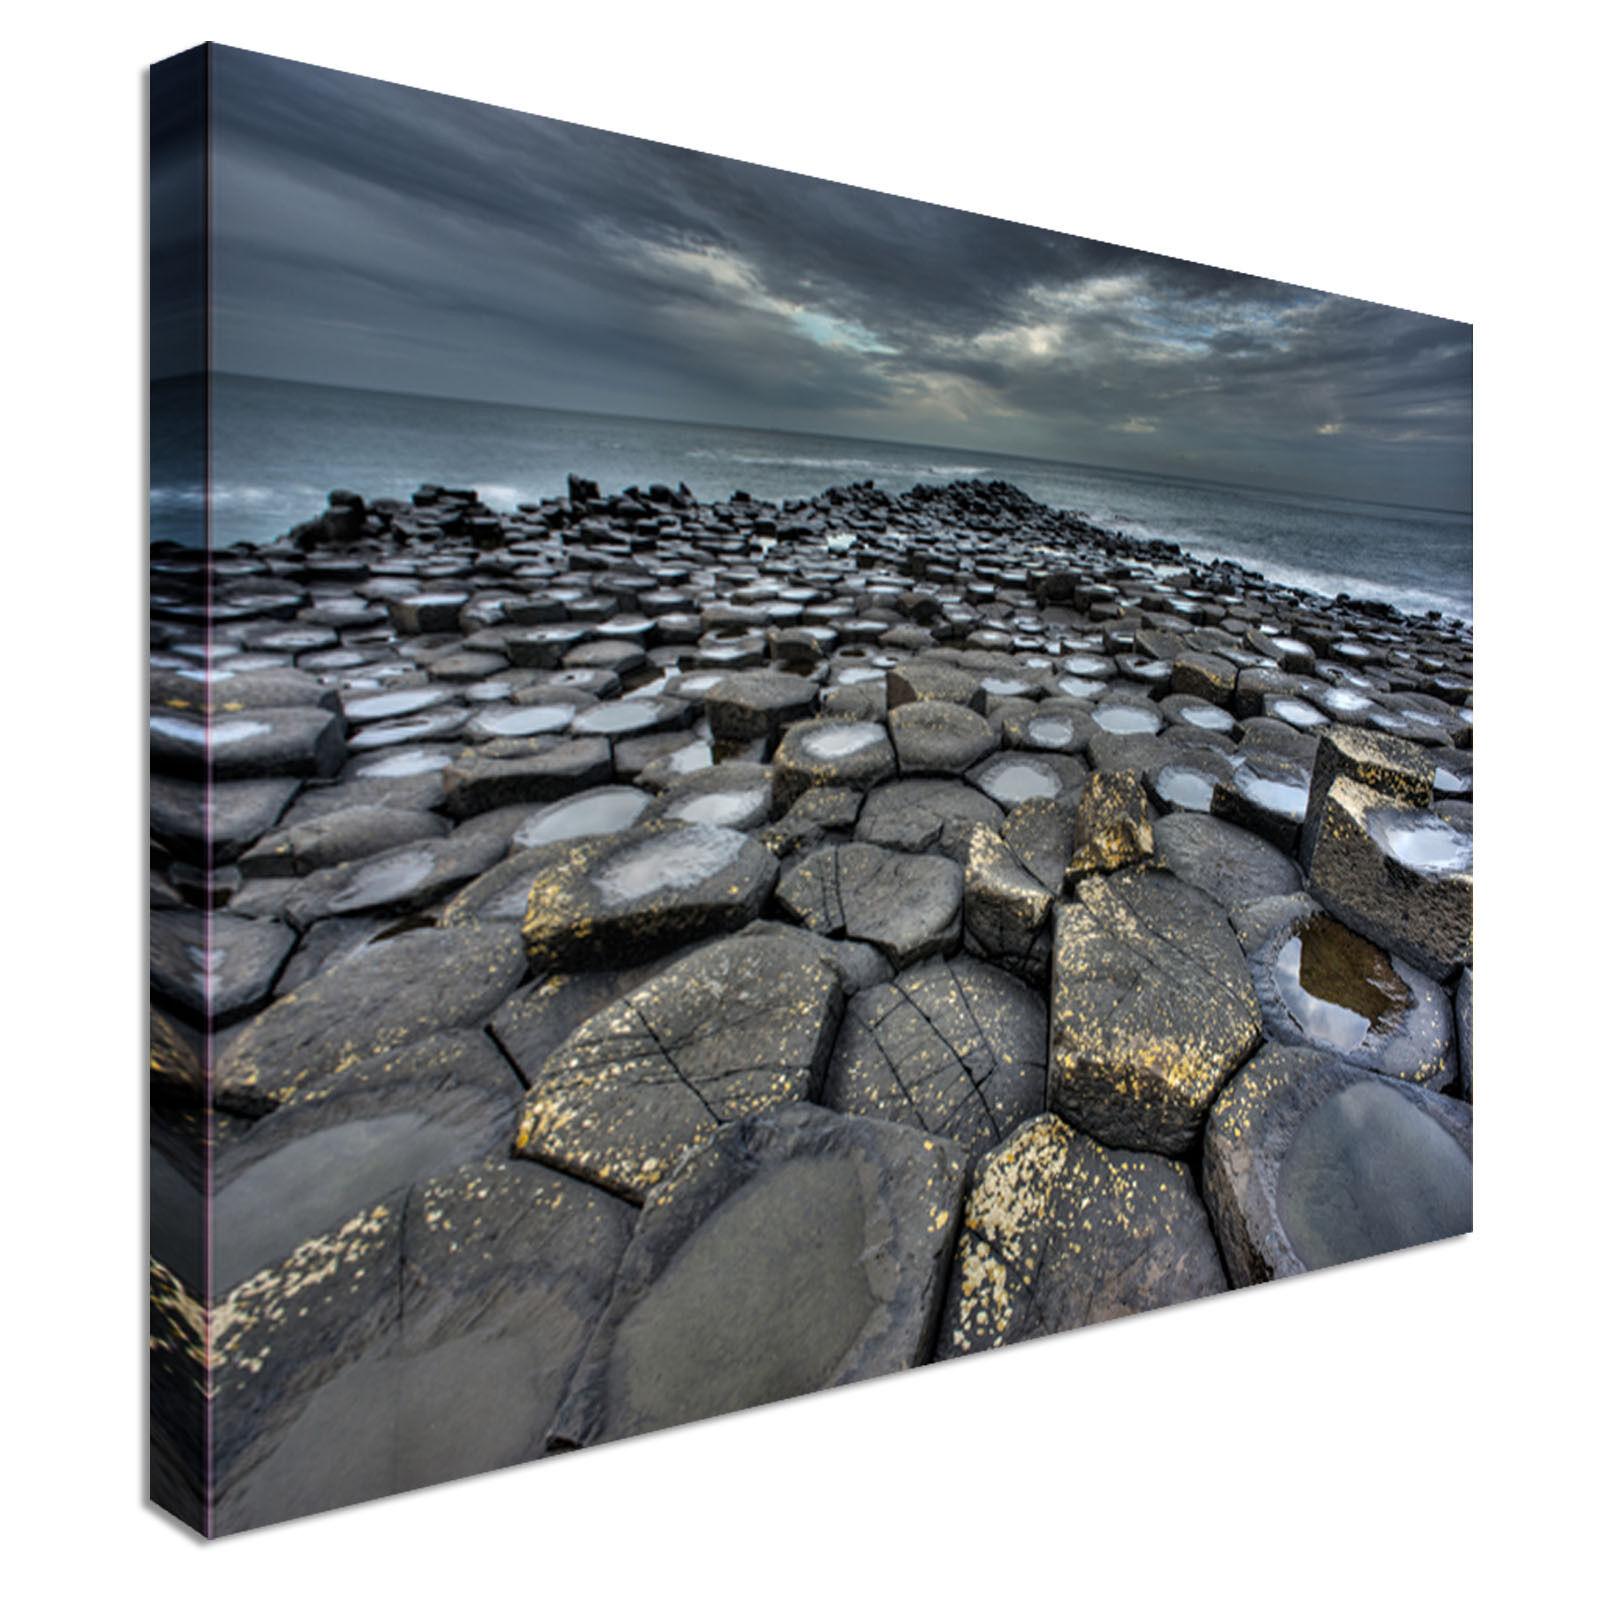 Giant's Causeway Canvas Wall Art prints high quality